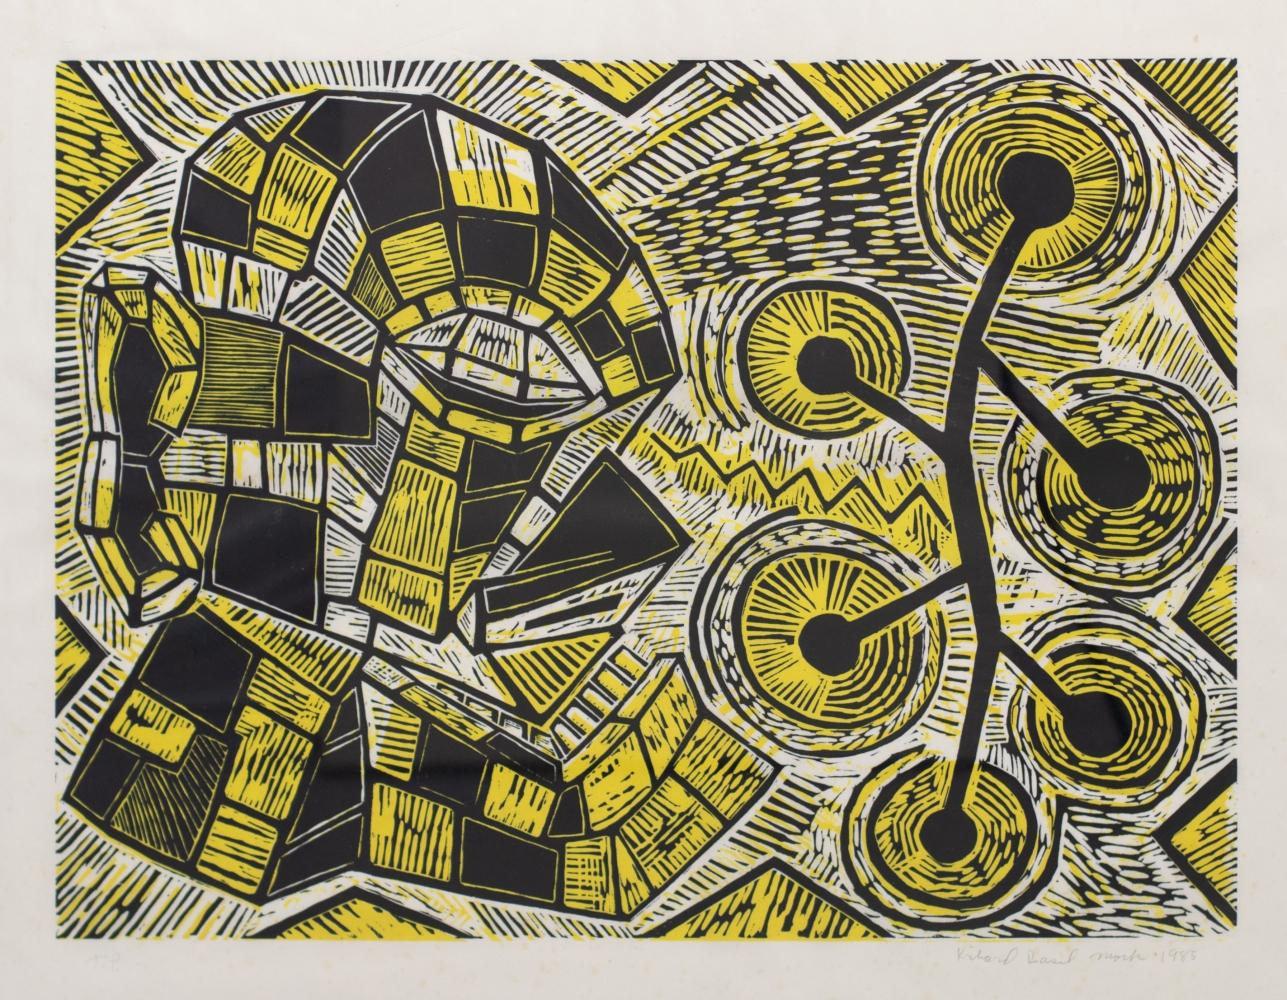 Richard Mock, Untitled, 1985, Linocut print, 35.25 x 42.75 inches